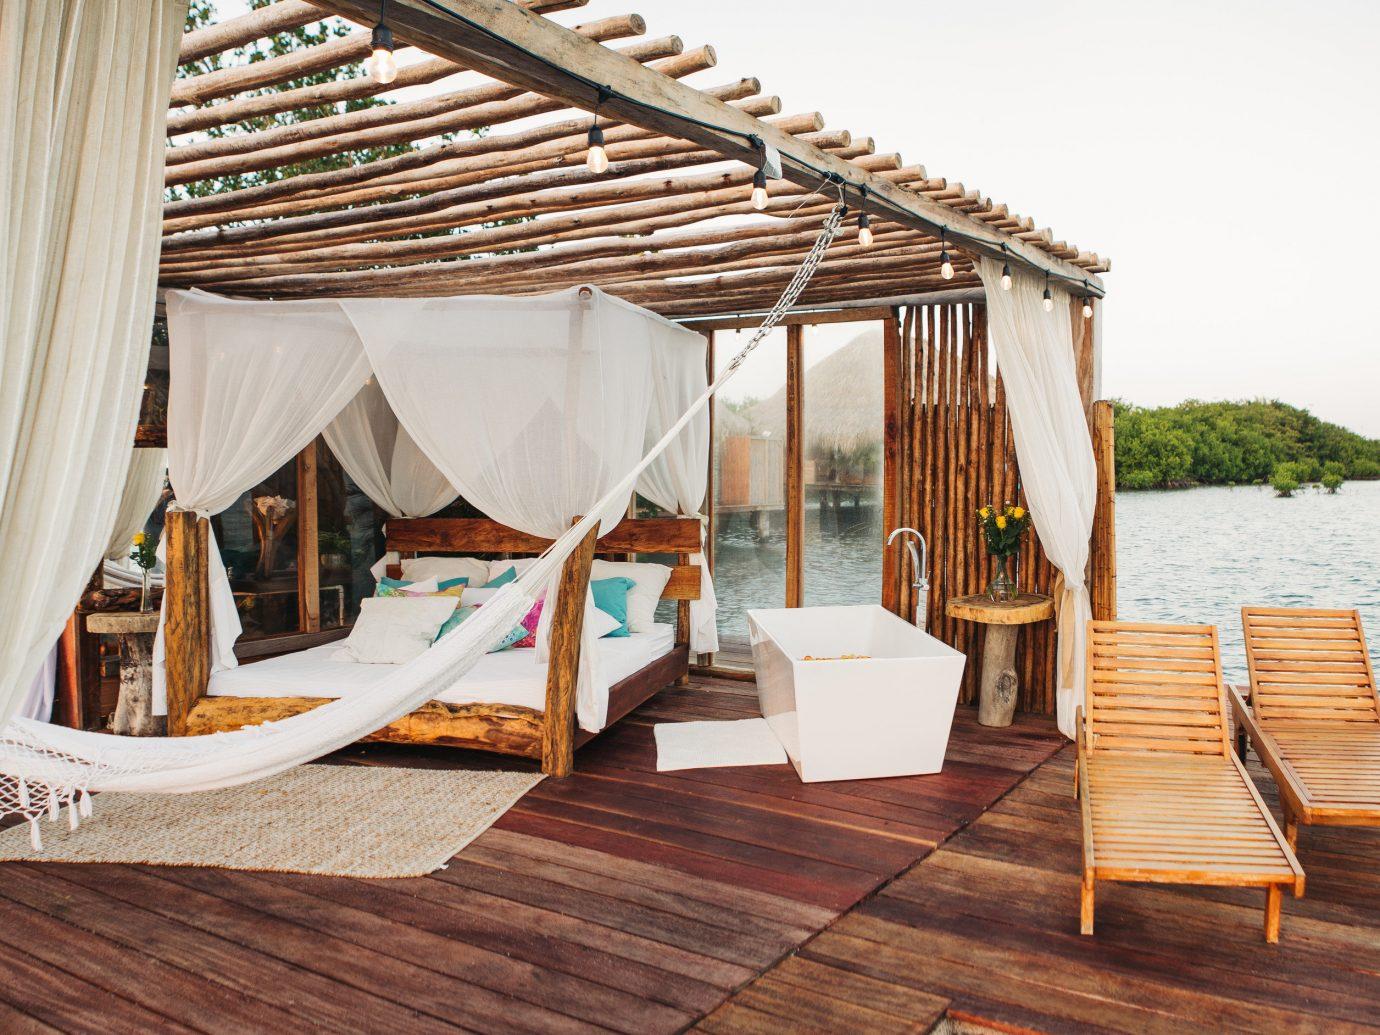 Aruba caribbean Hotels furniture outdoor furniture sunlounger wood vacation Resort tent outdoor structure